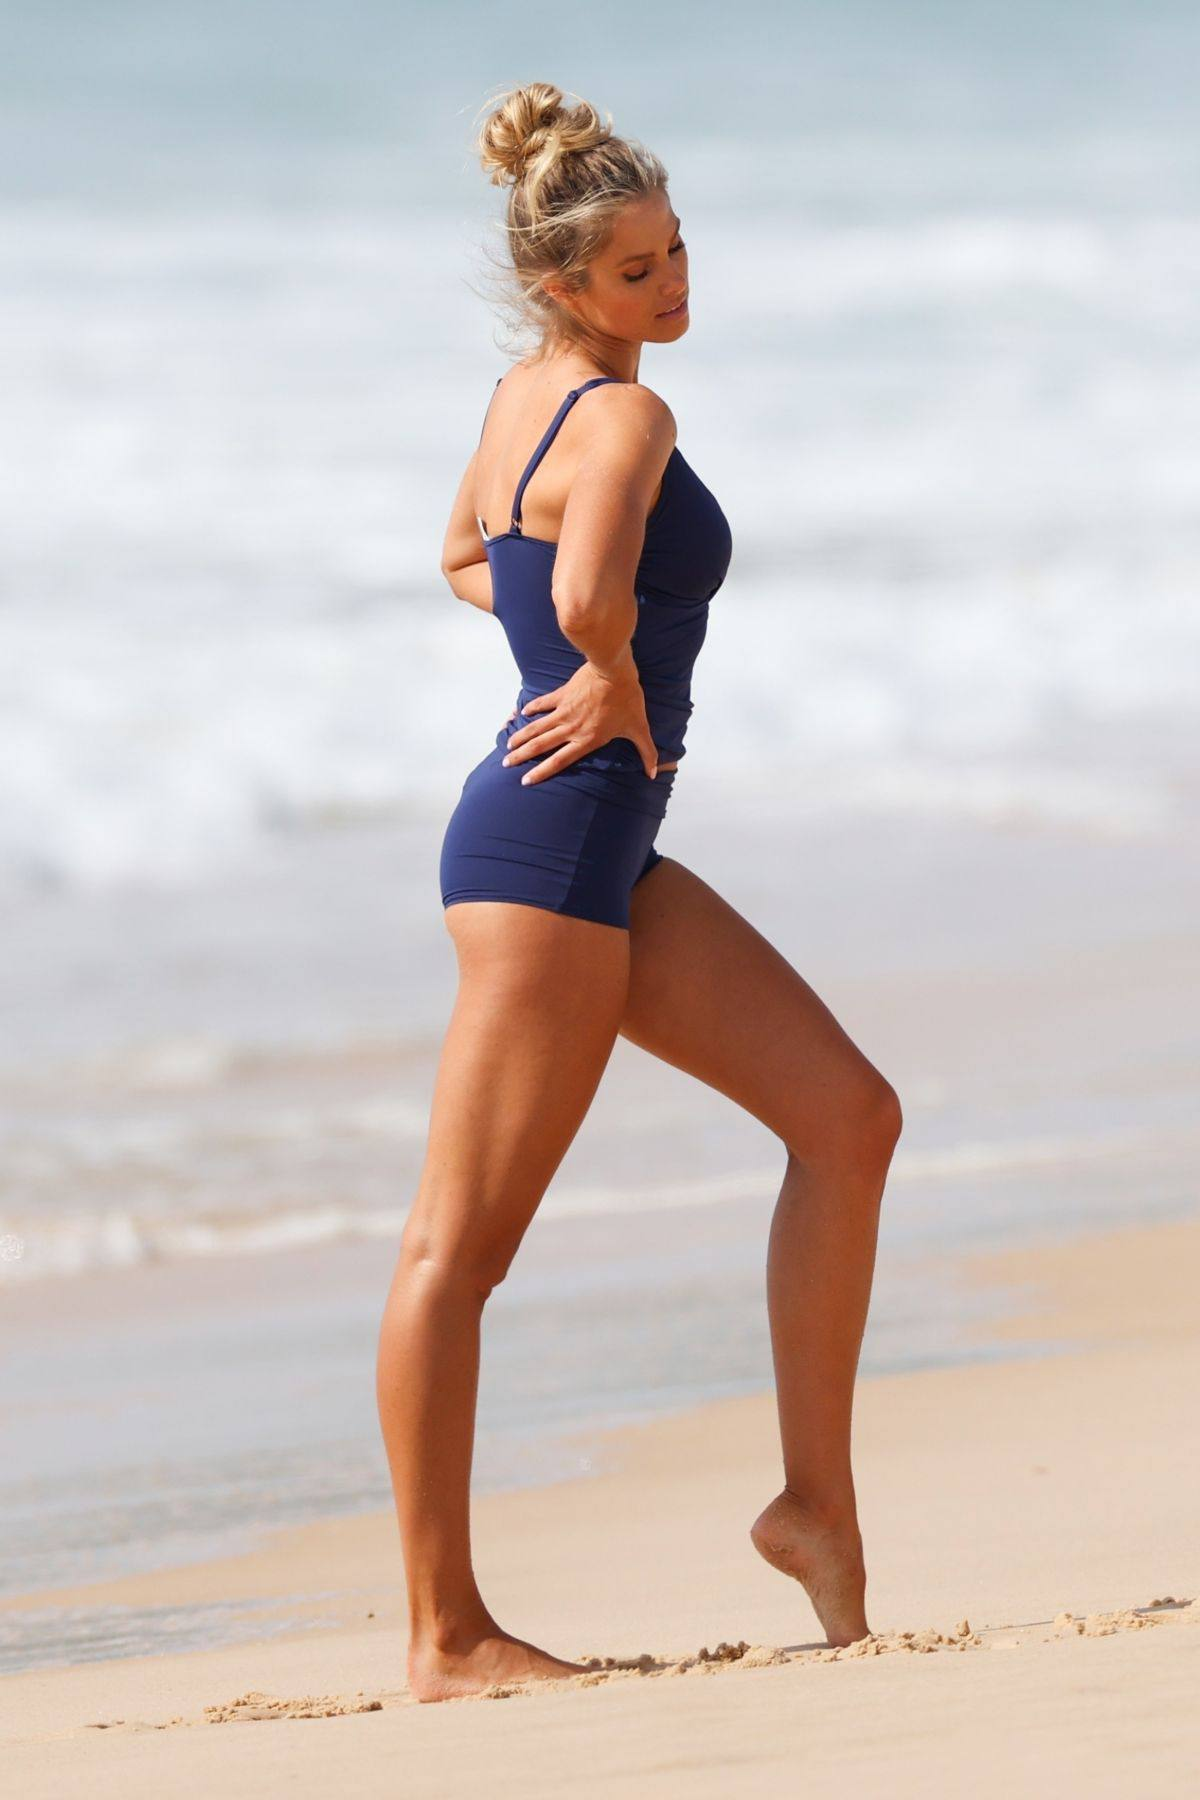 Natalie Roser Sexy On Beach